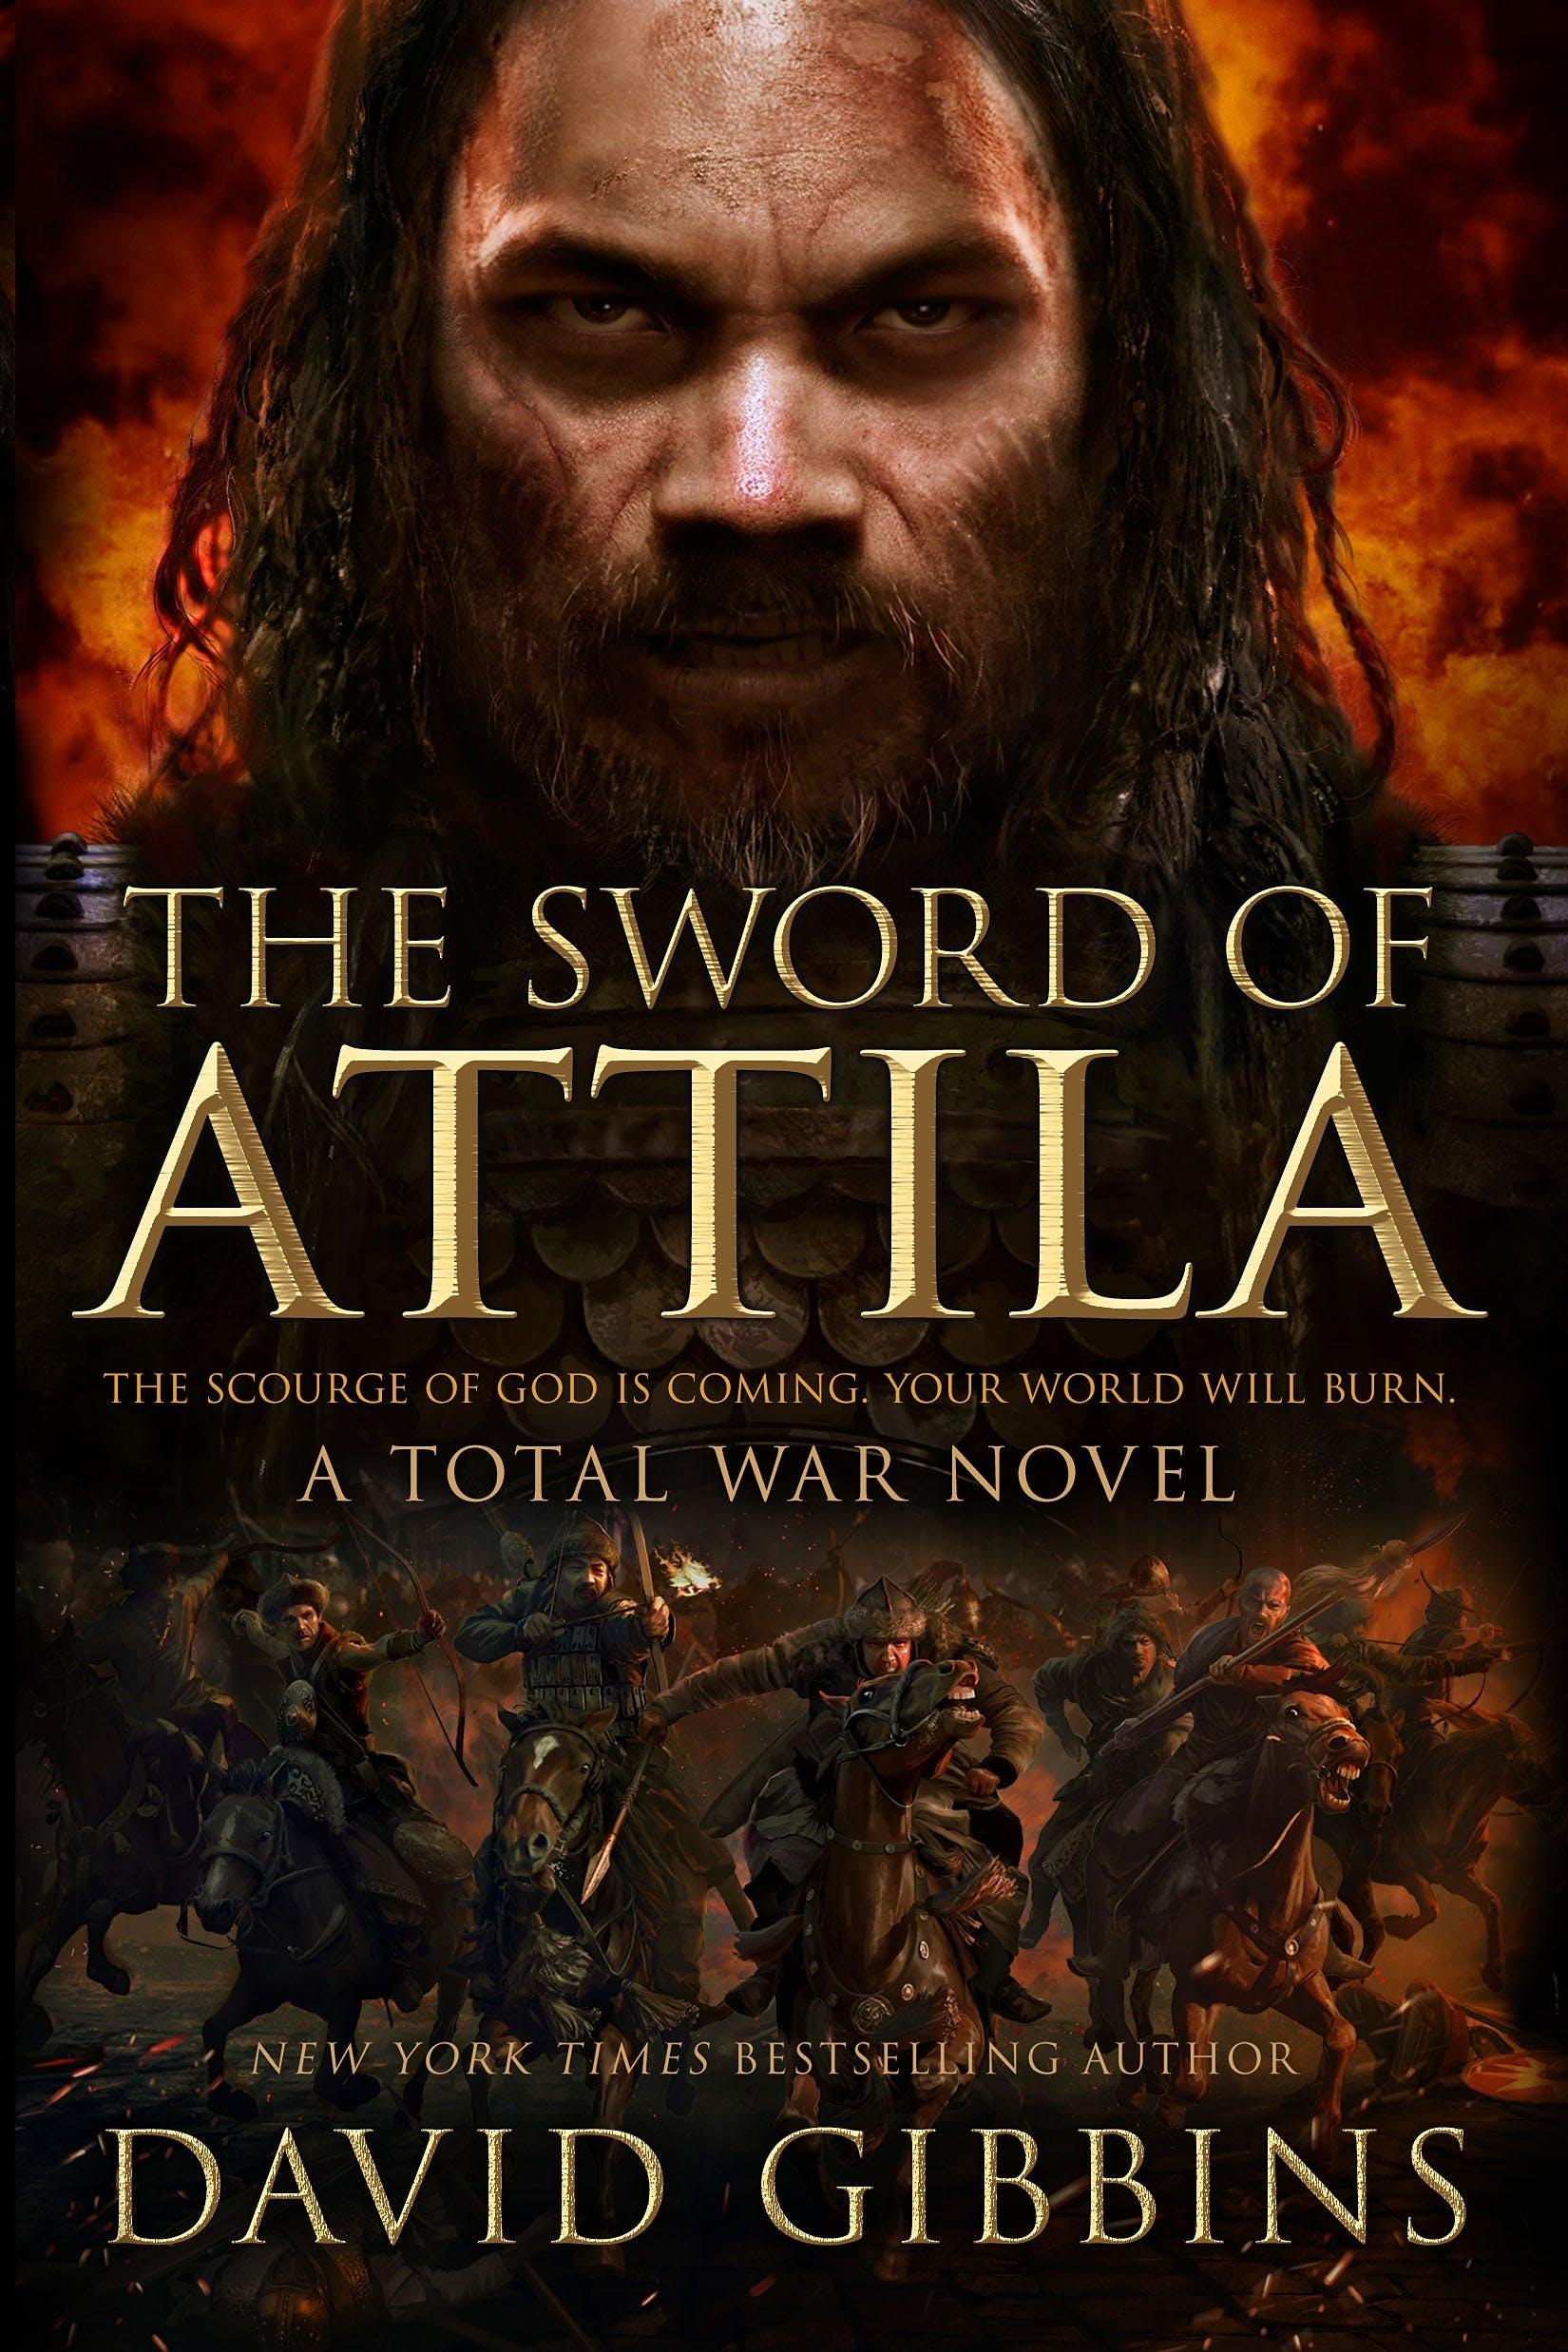 Image of The Sword of Attila